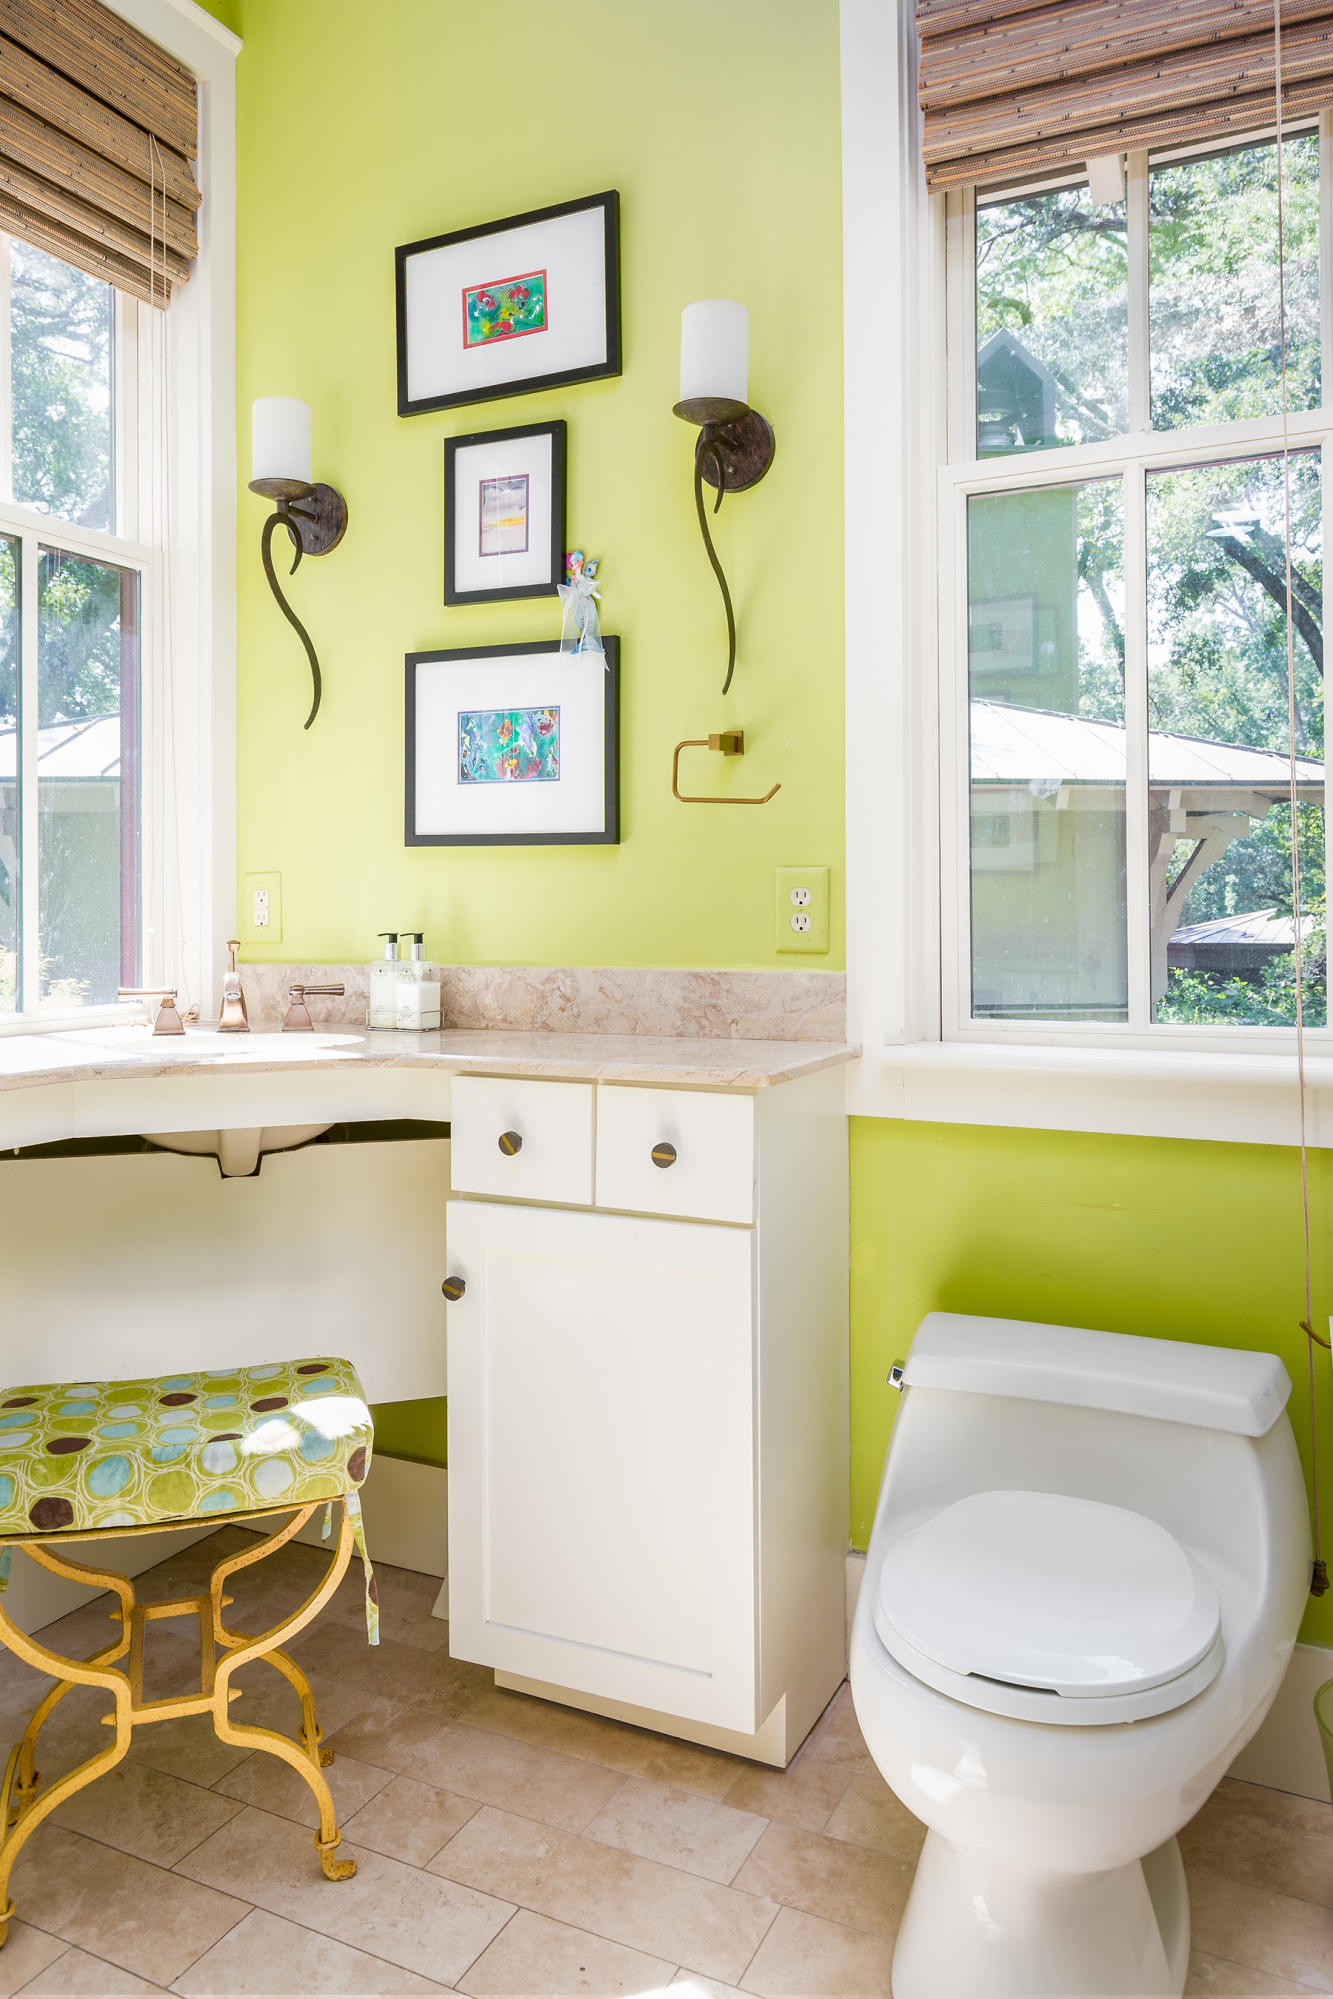 Ellis Oaks Homes For Sale - 672 Ellis Oak, Charleston, SC - 45